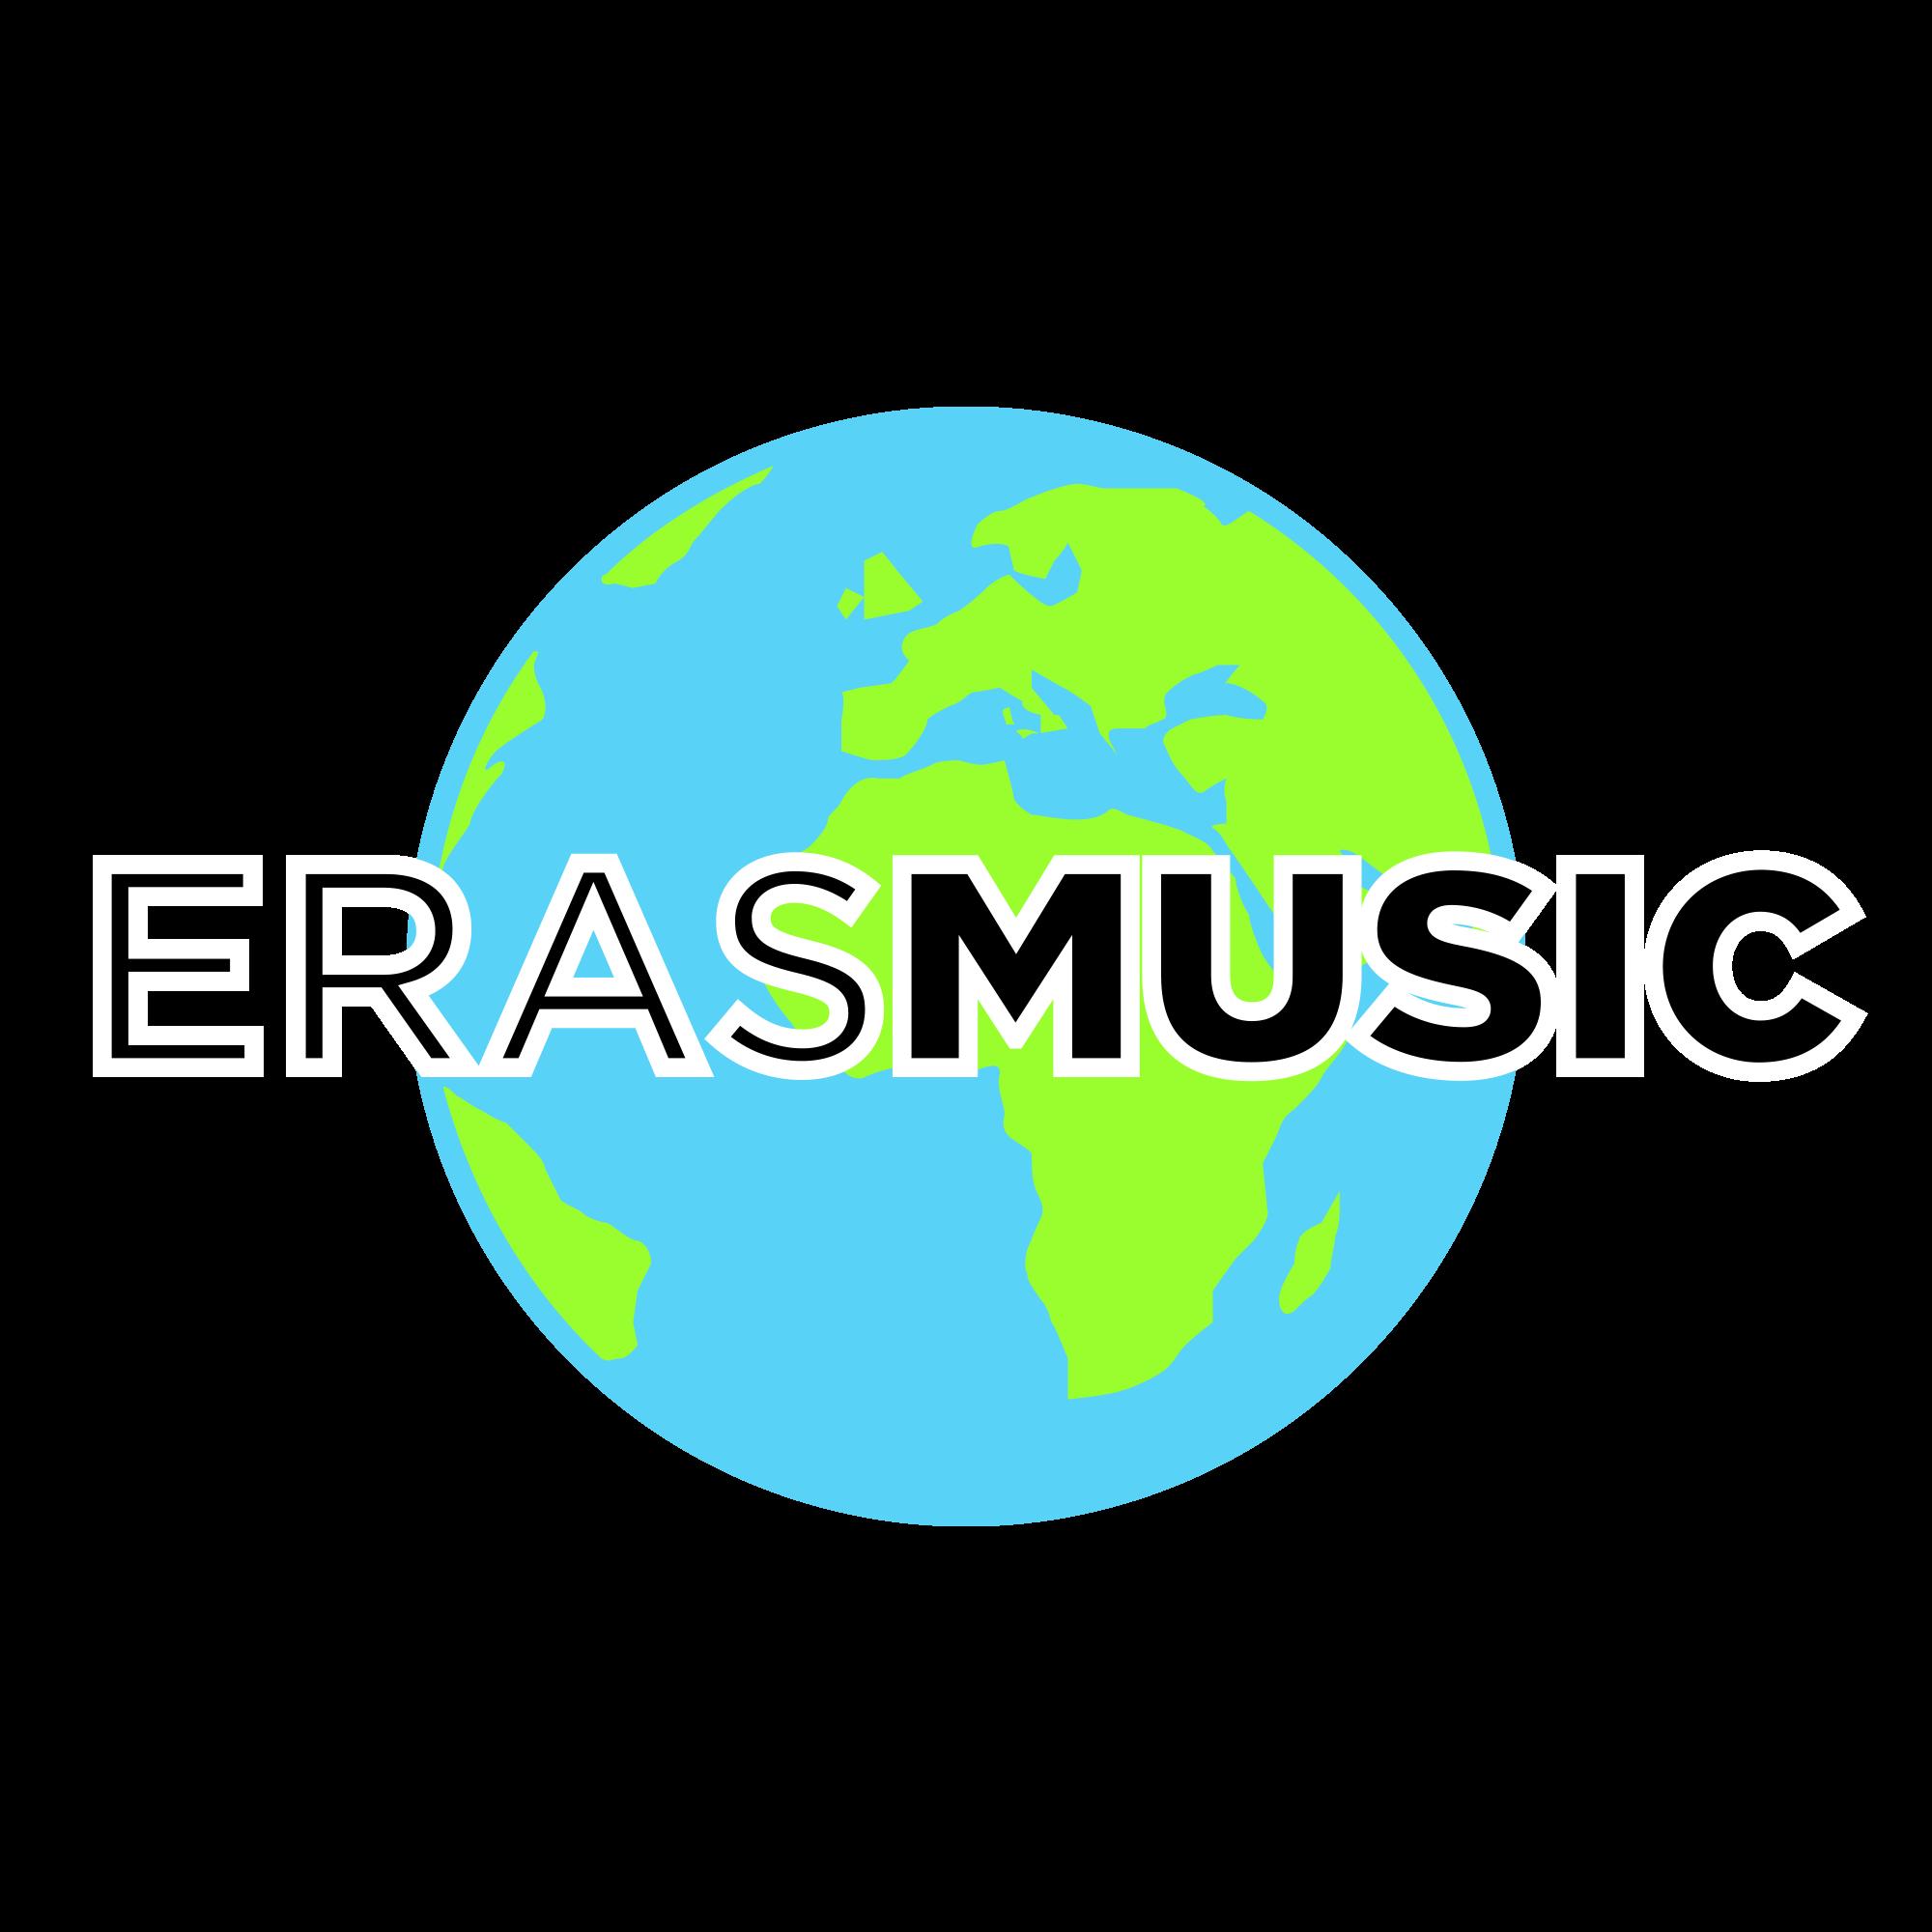 Erasmusic